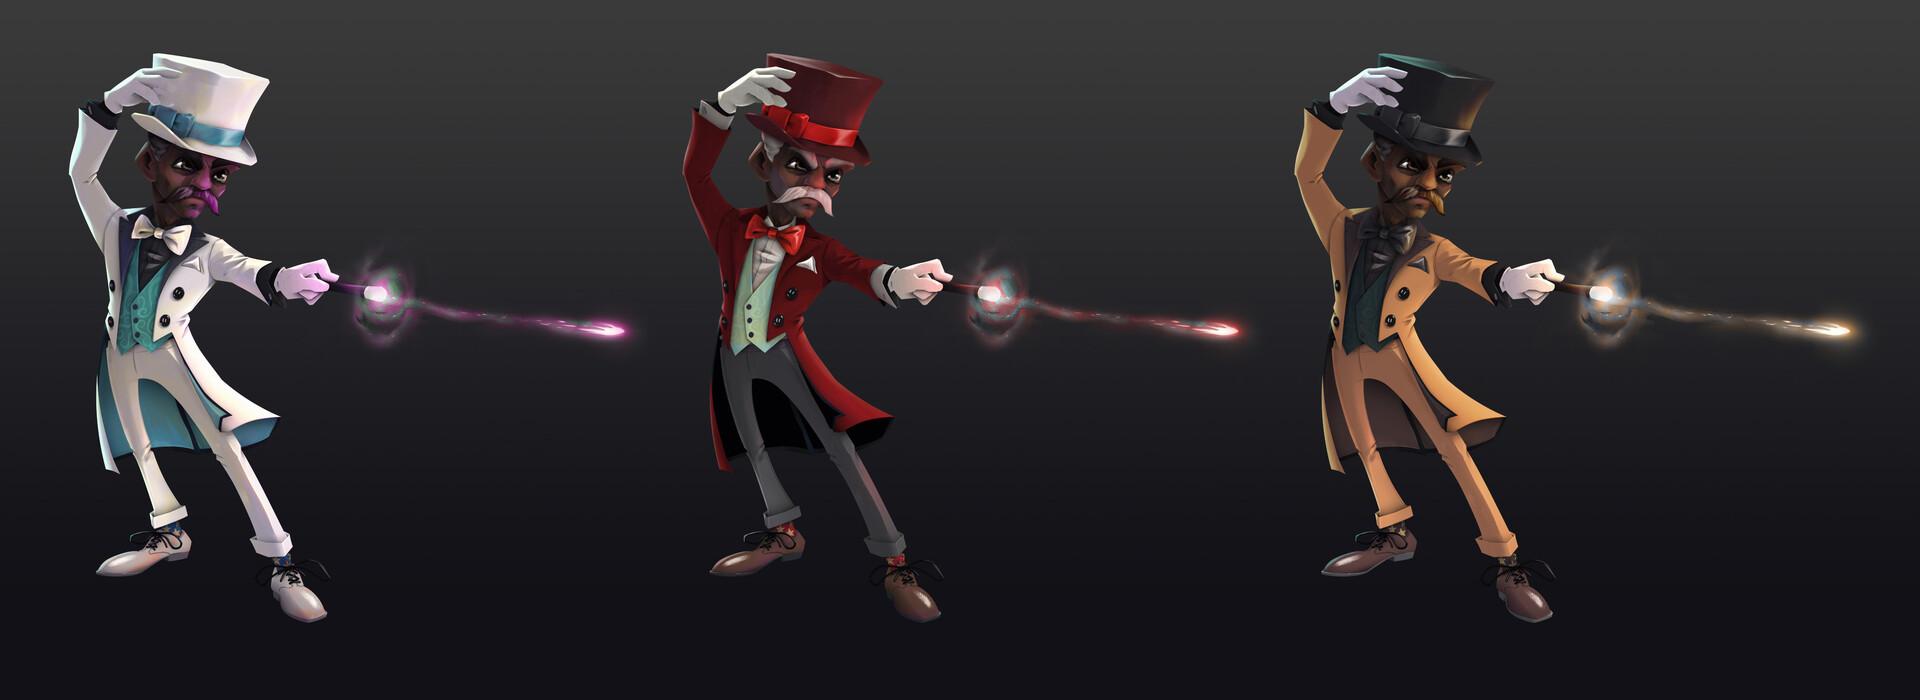 Jake bullock magician 07 variants